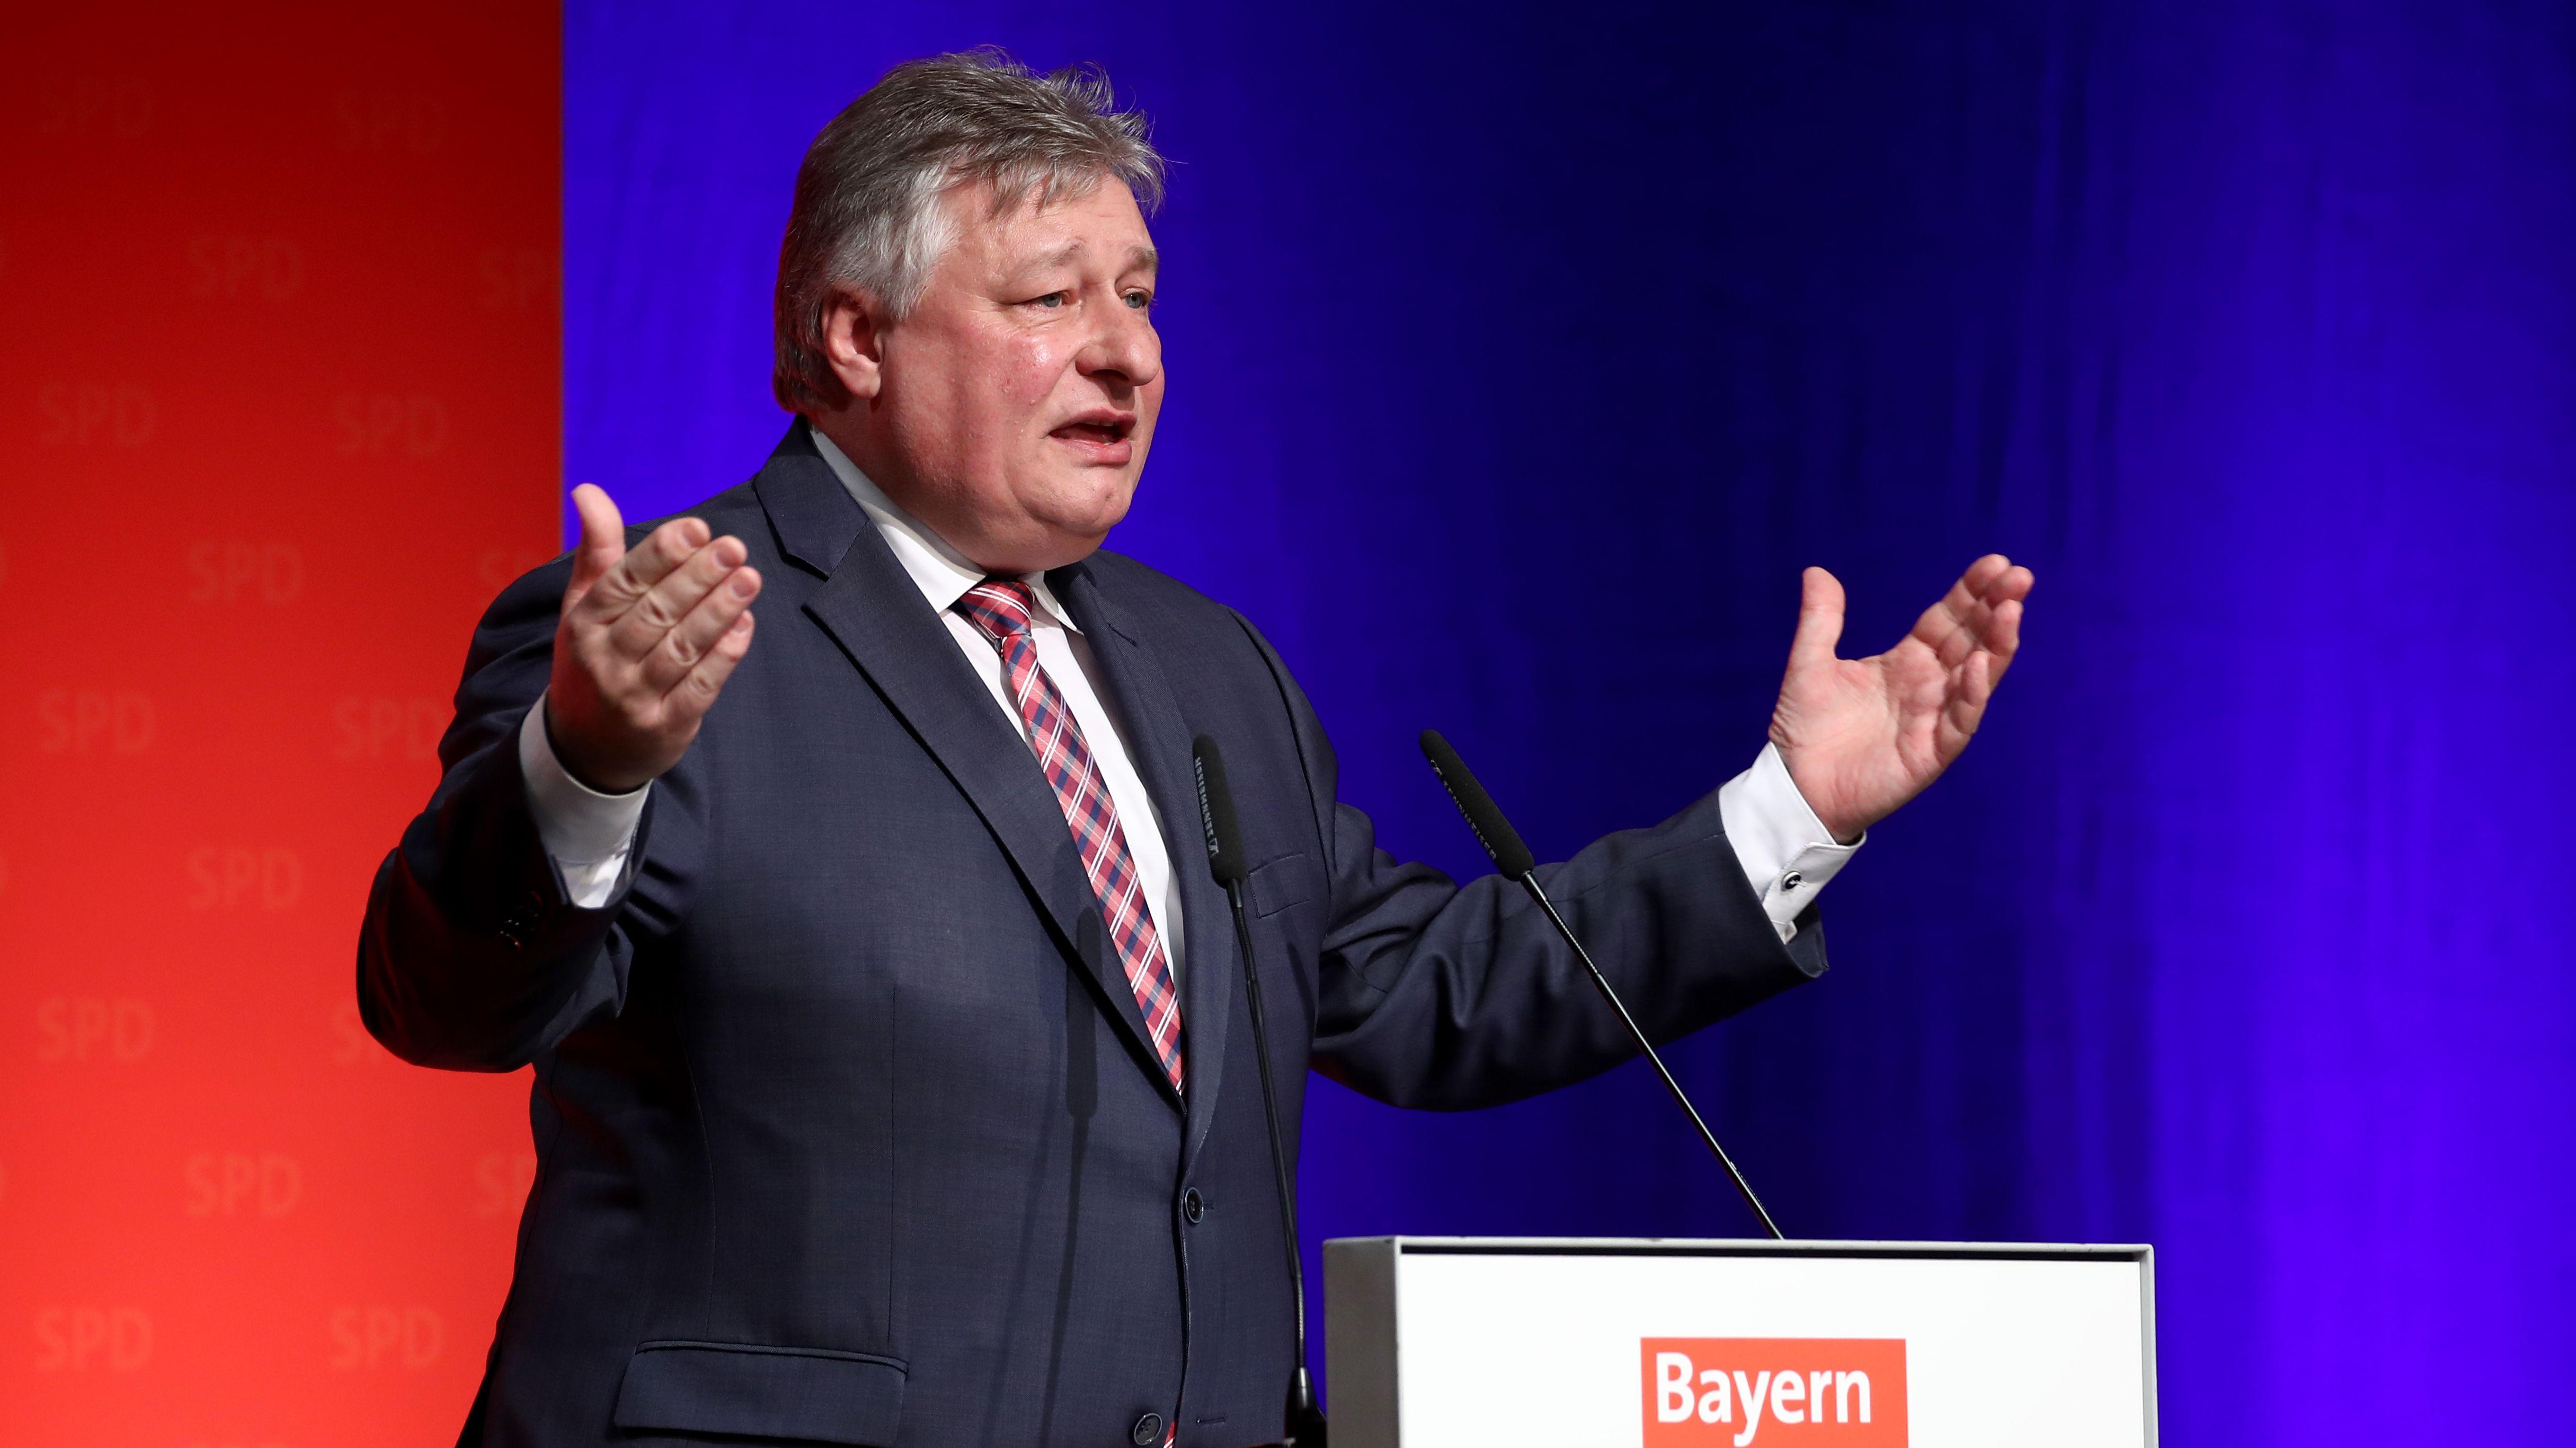 Der Chef der Landesgruppe Bayern in der SPD-Fraktion, Martin Burkert